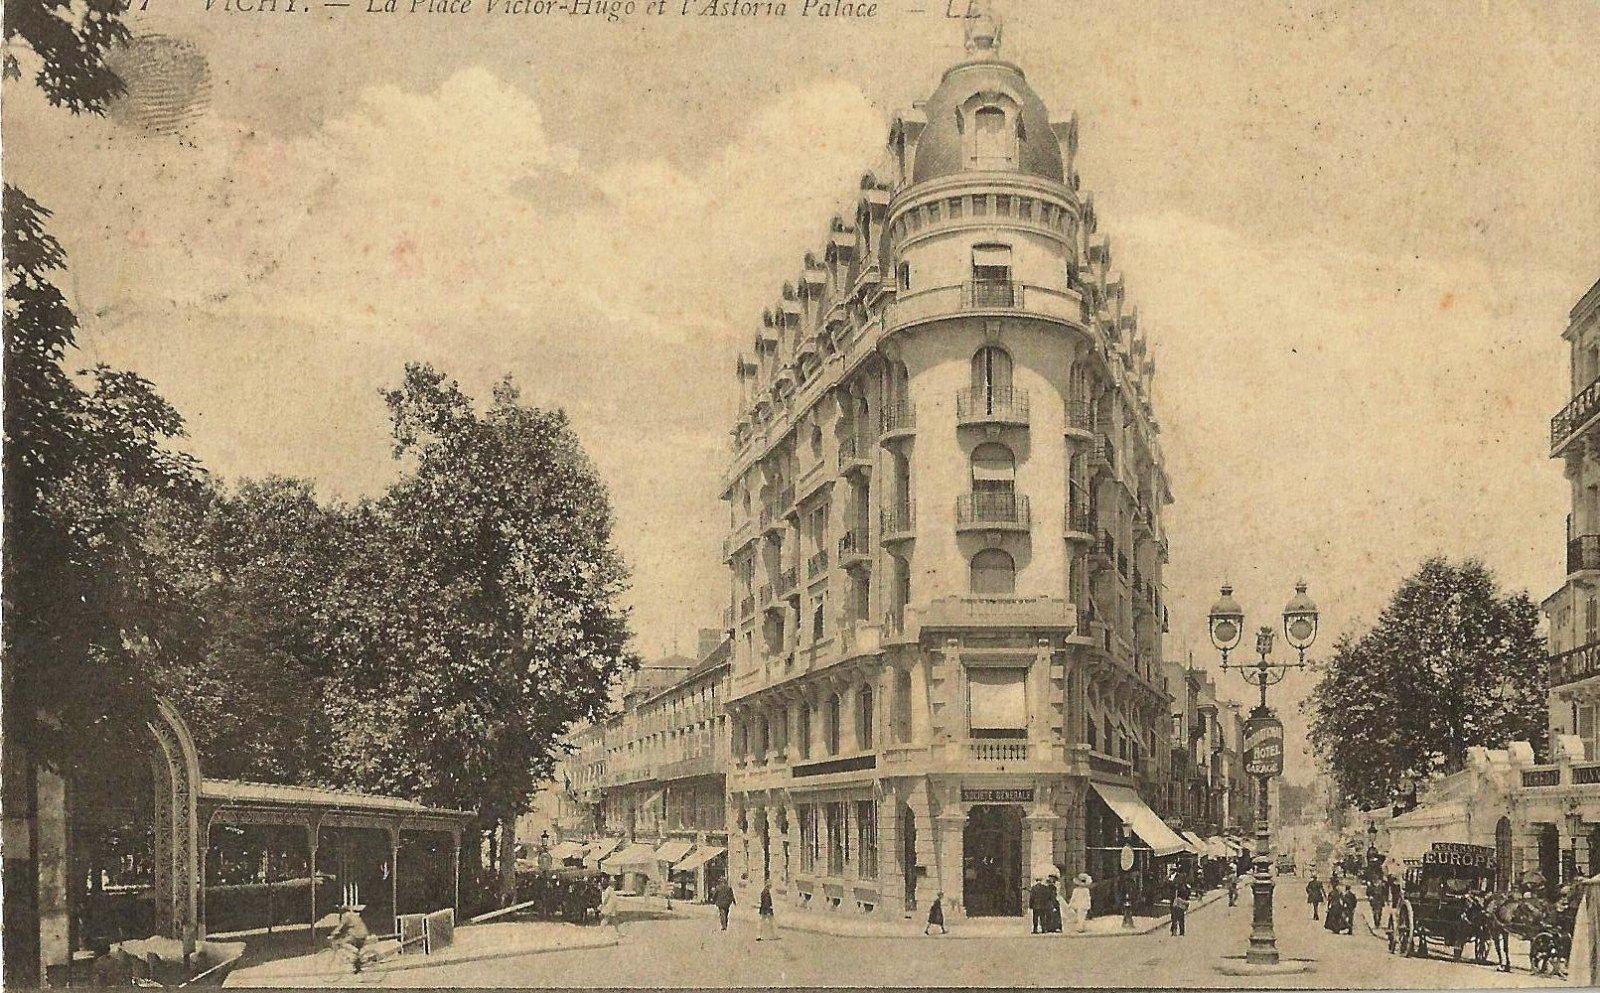 VICHY ASTORIA PALACE 1913